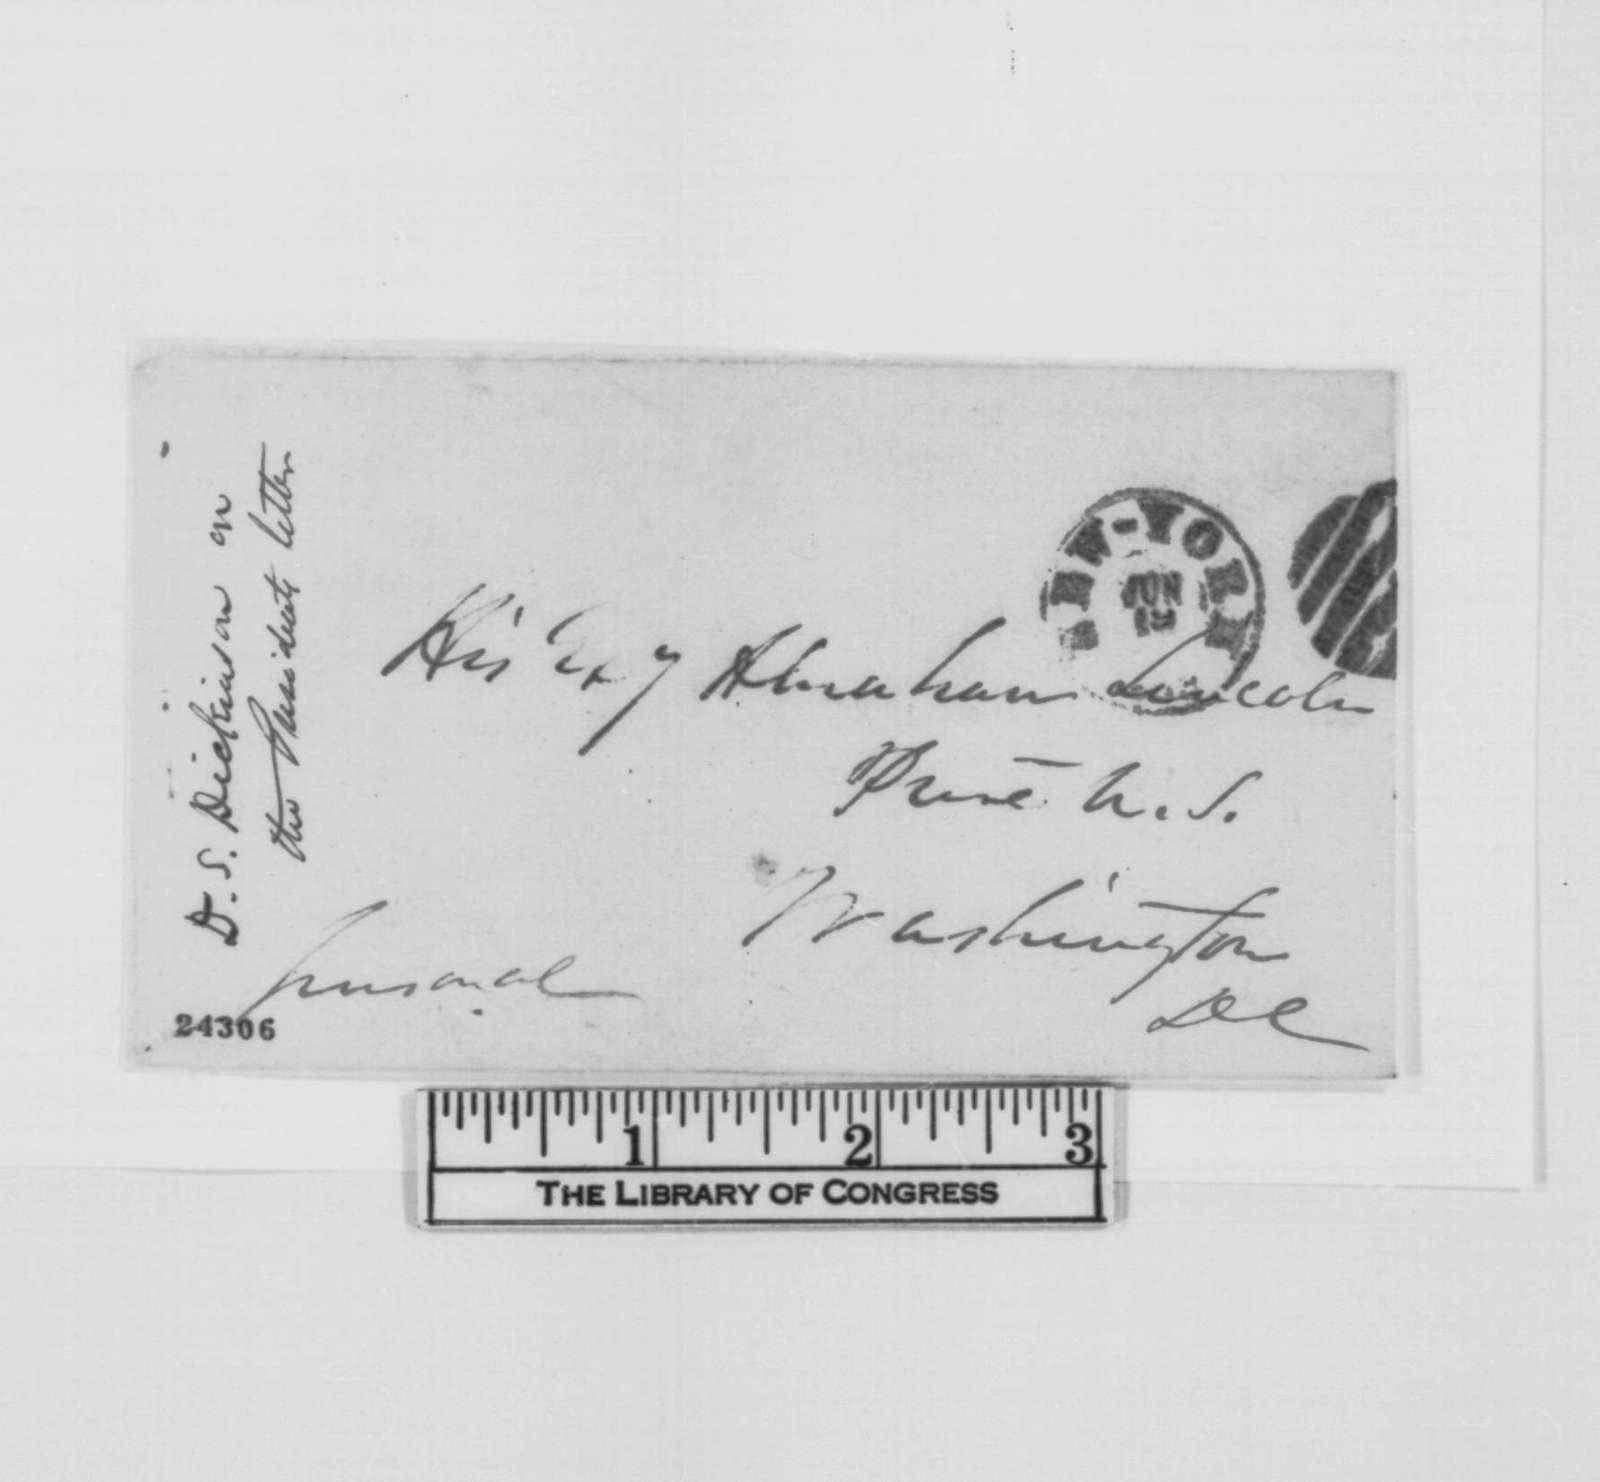 Daniel S. Dickinson to Abraham Lincoln, Friday, June 19, 1863  (Praises Lincoln's letter to Corning)